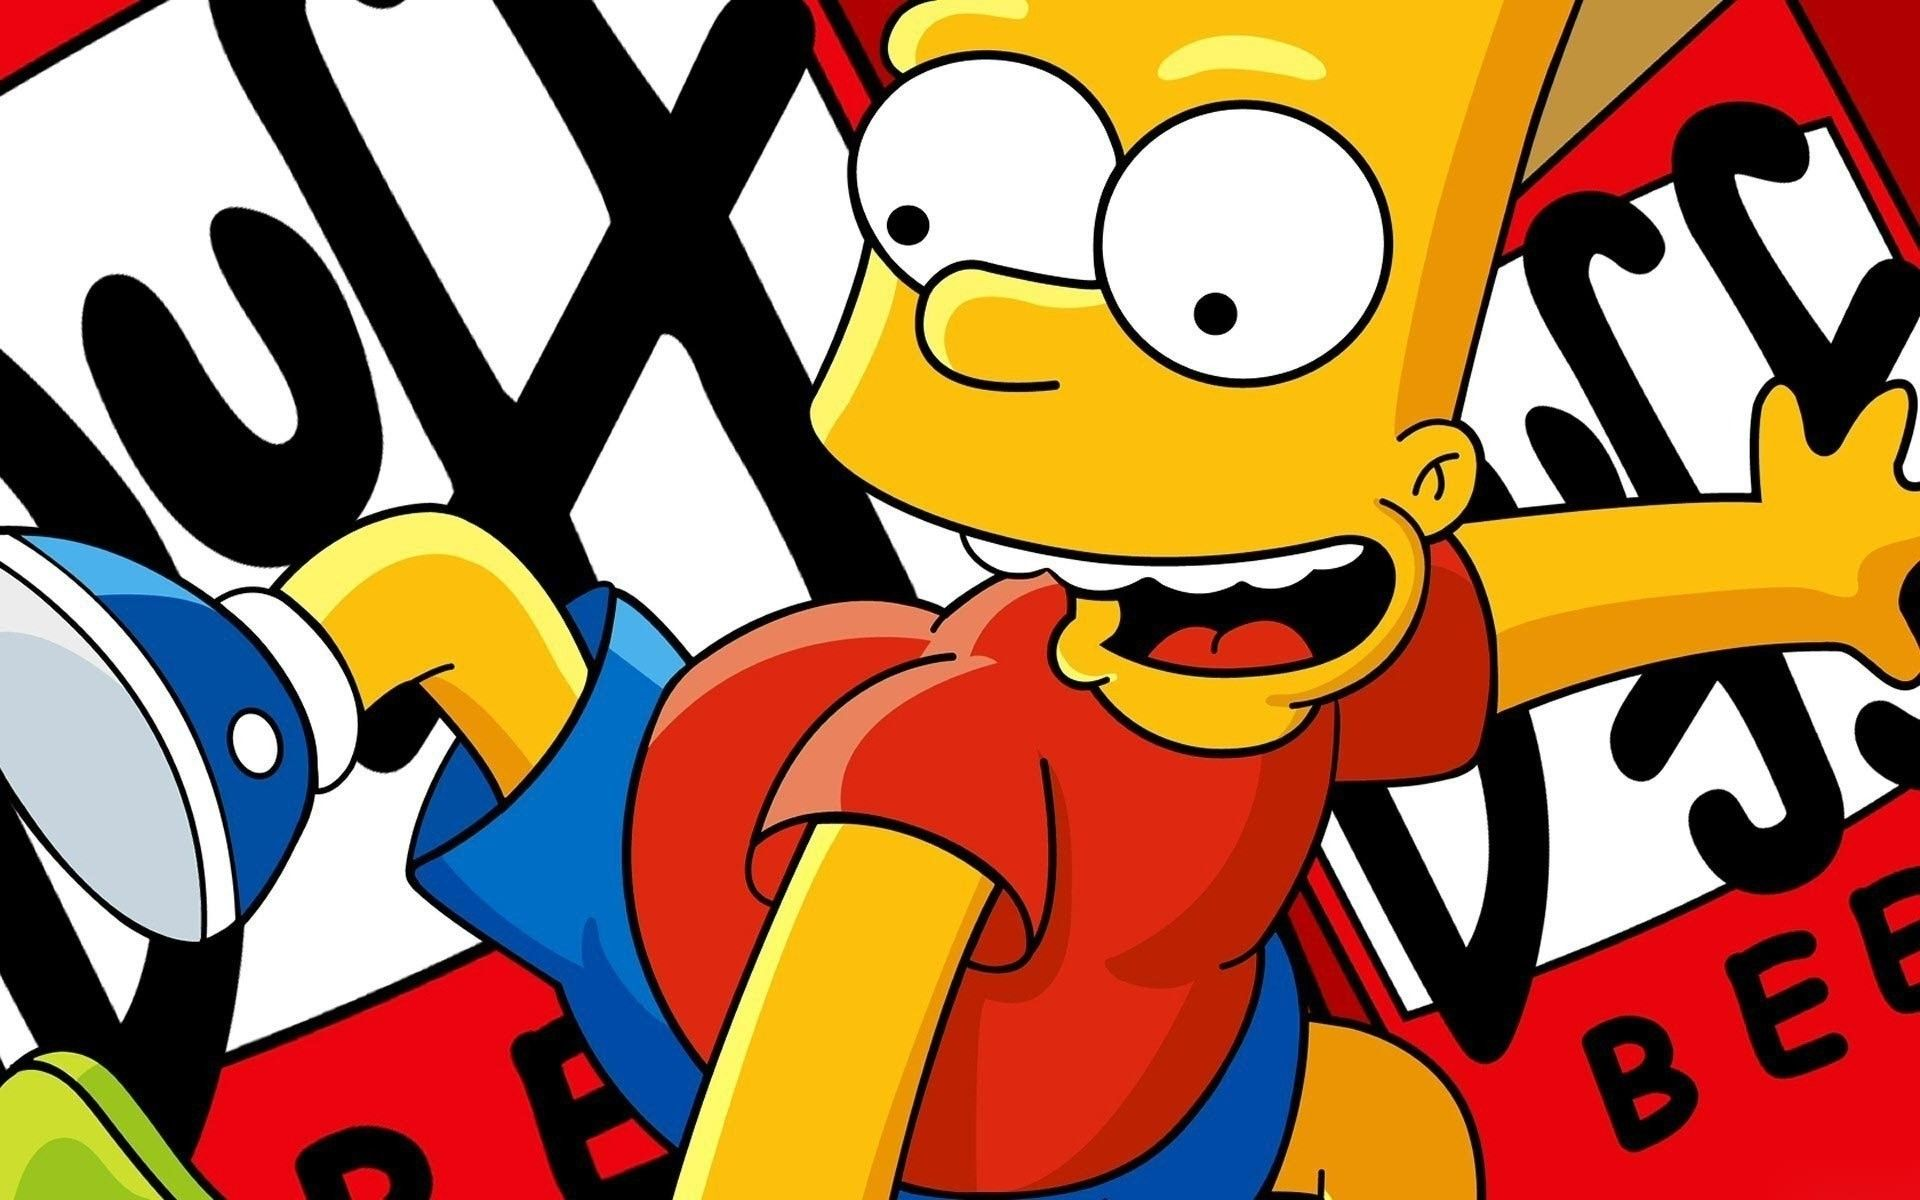 Supreme Bape Bart Simpson Wallpapers Top Free Supreme Bape Bart Simpson Backgrounds Wallpaperaccess